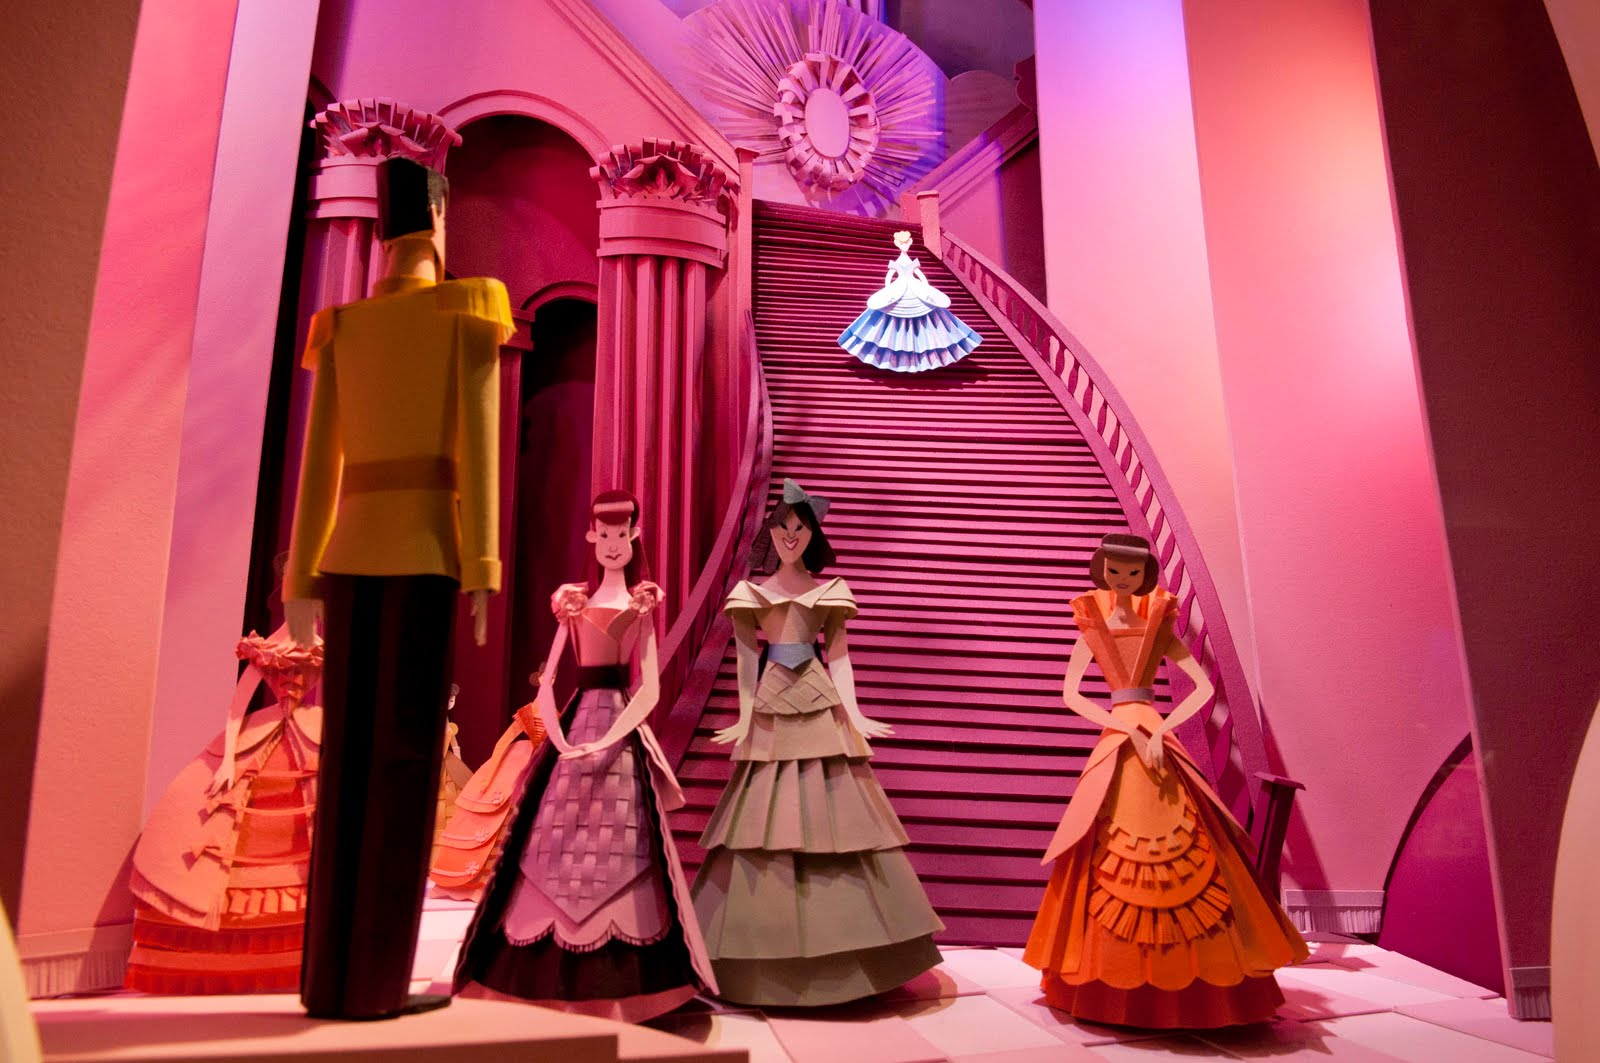 CinderellaView1.jpg